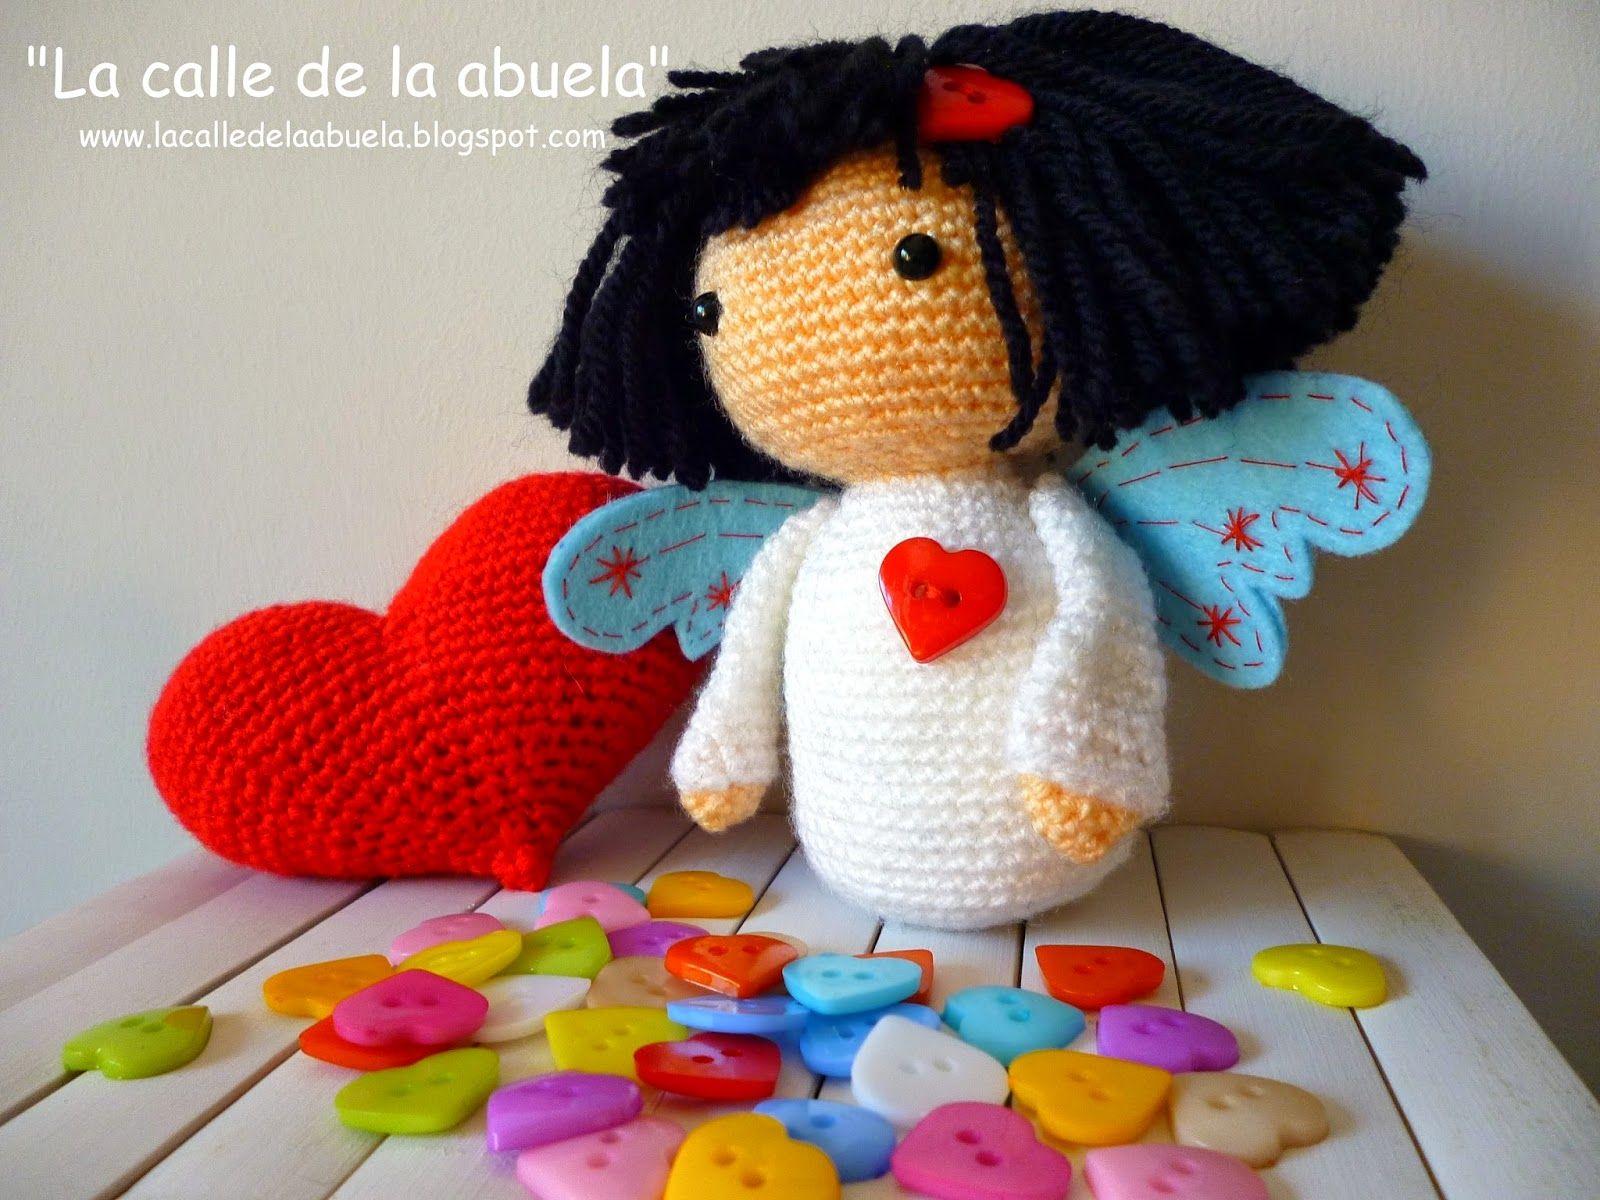 Crochet Amigurumi Doll Free : Crochet basics wonder woman amigurumi anime kawaii free